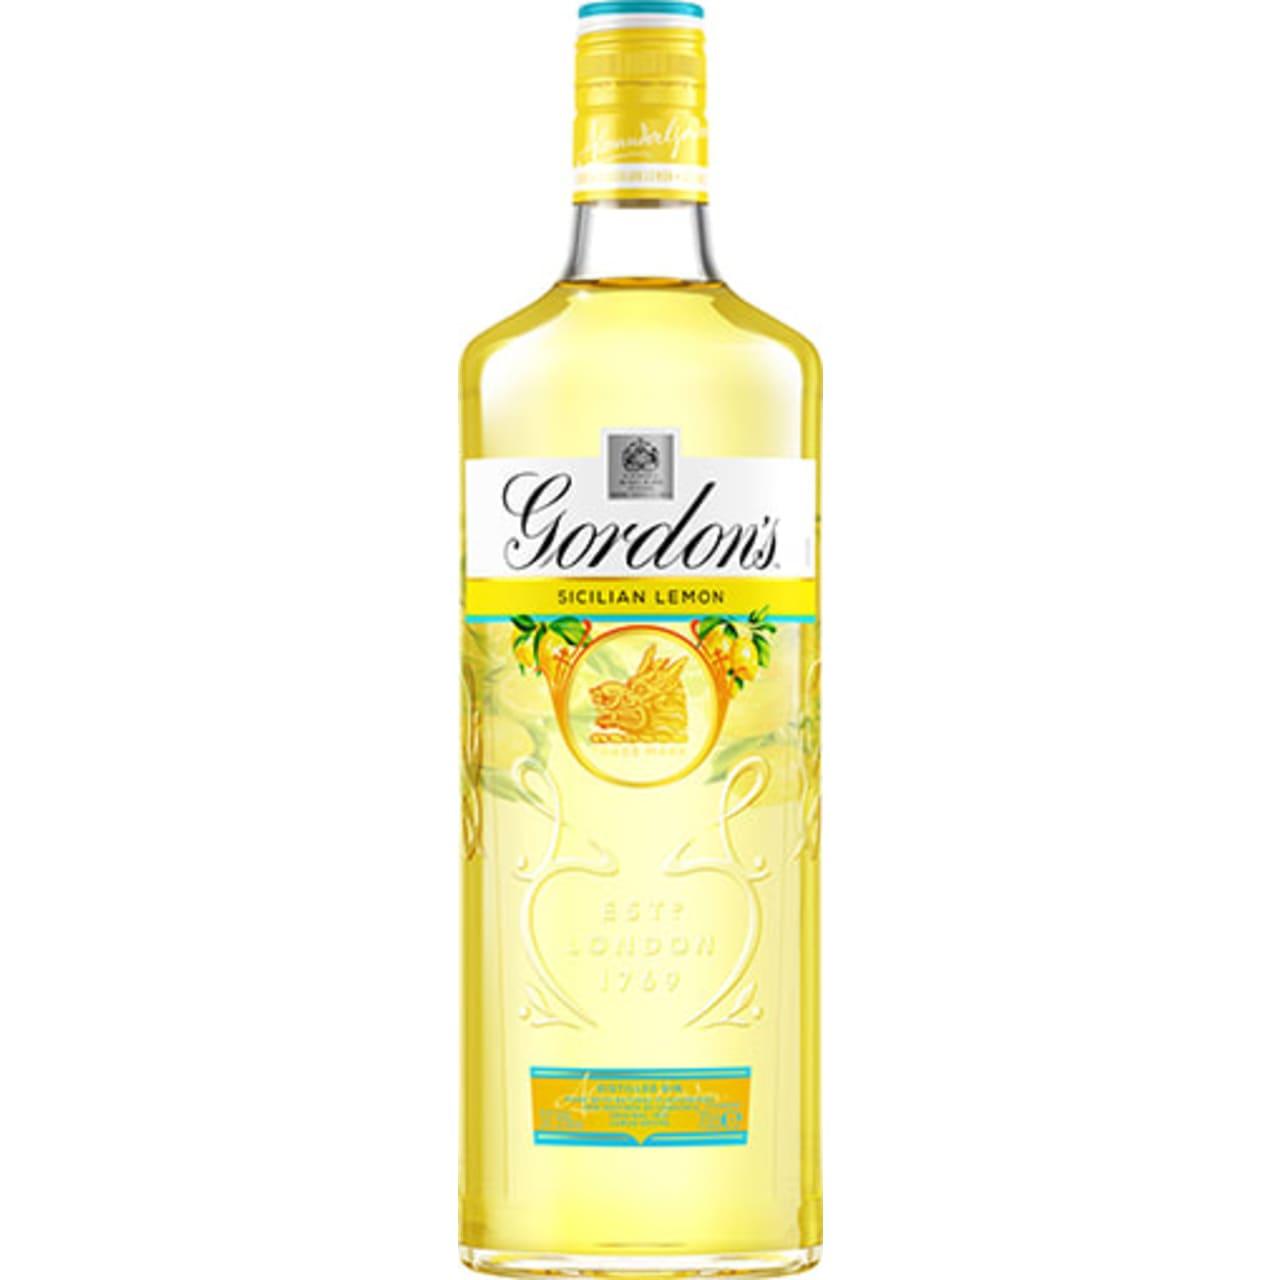 Product Image - Gordon's Sicilian Lemon Gin